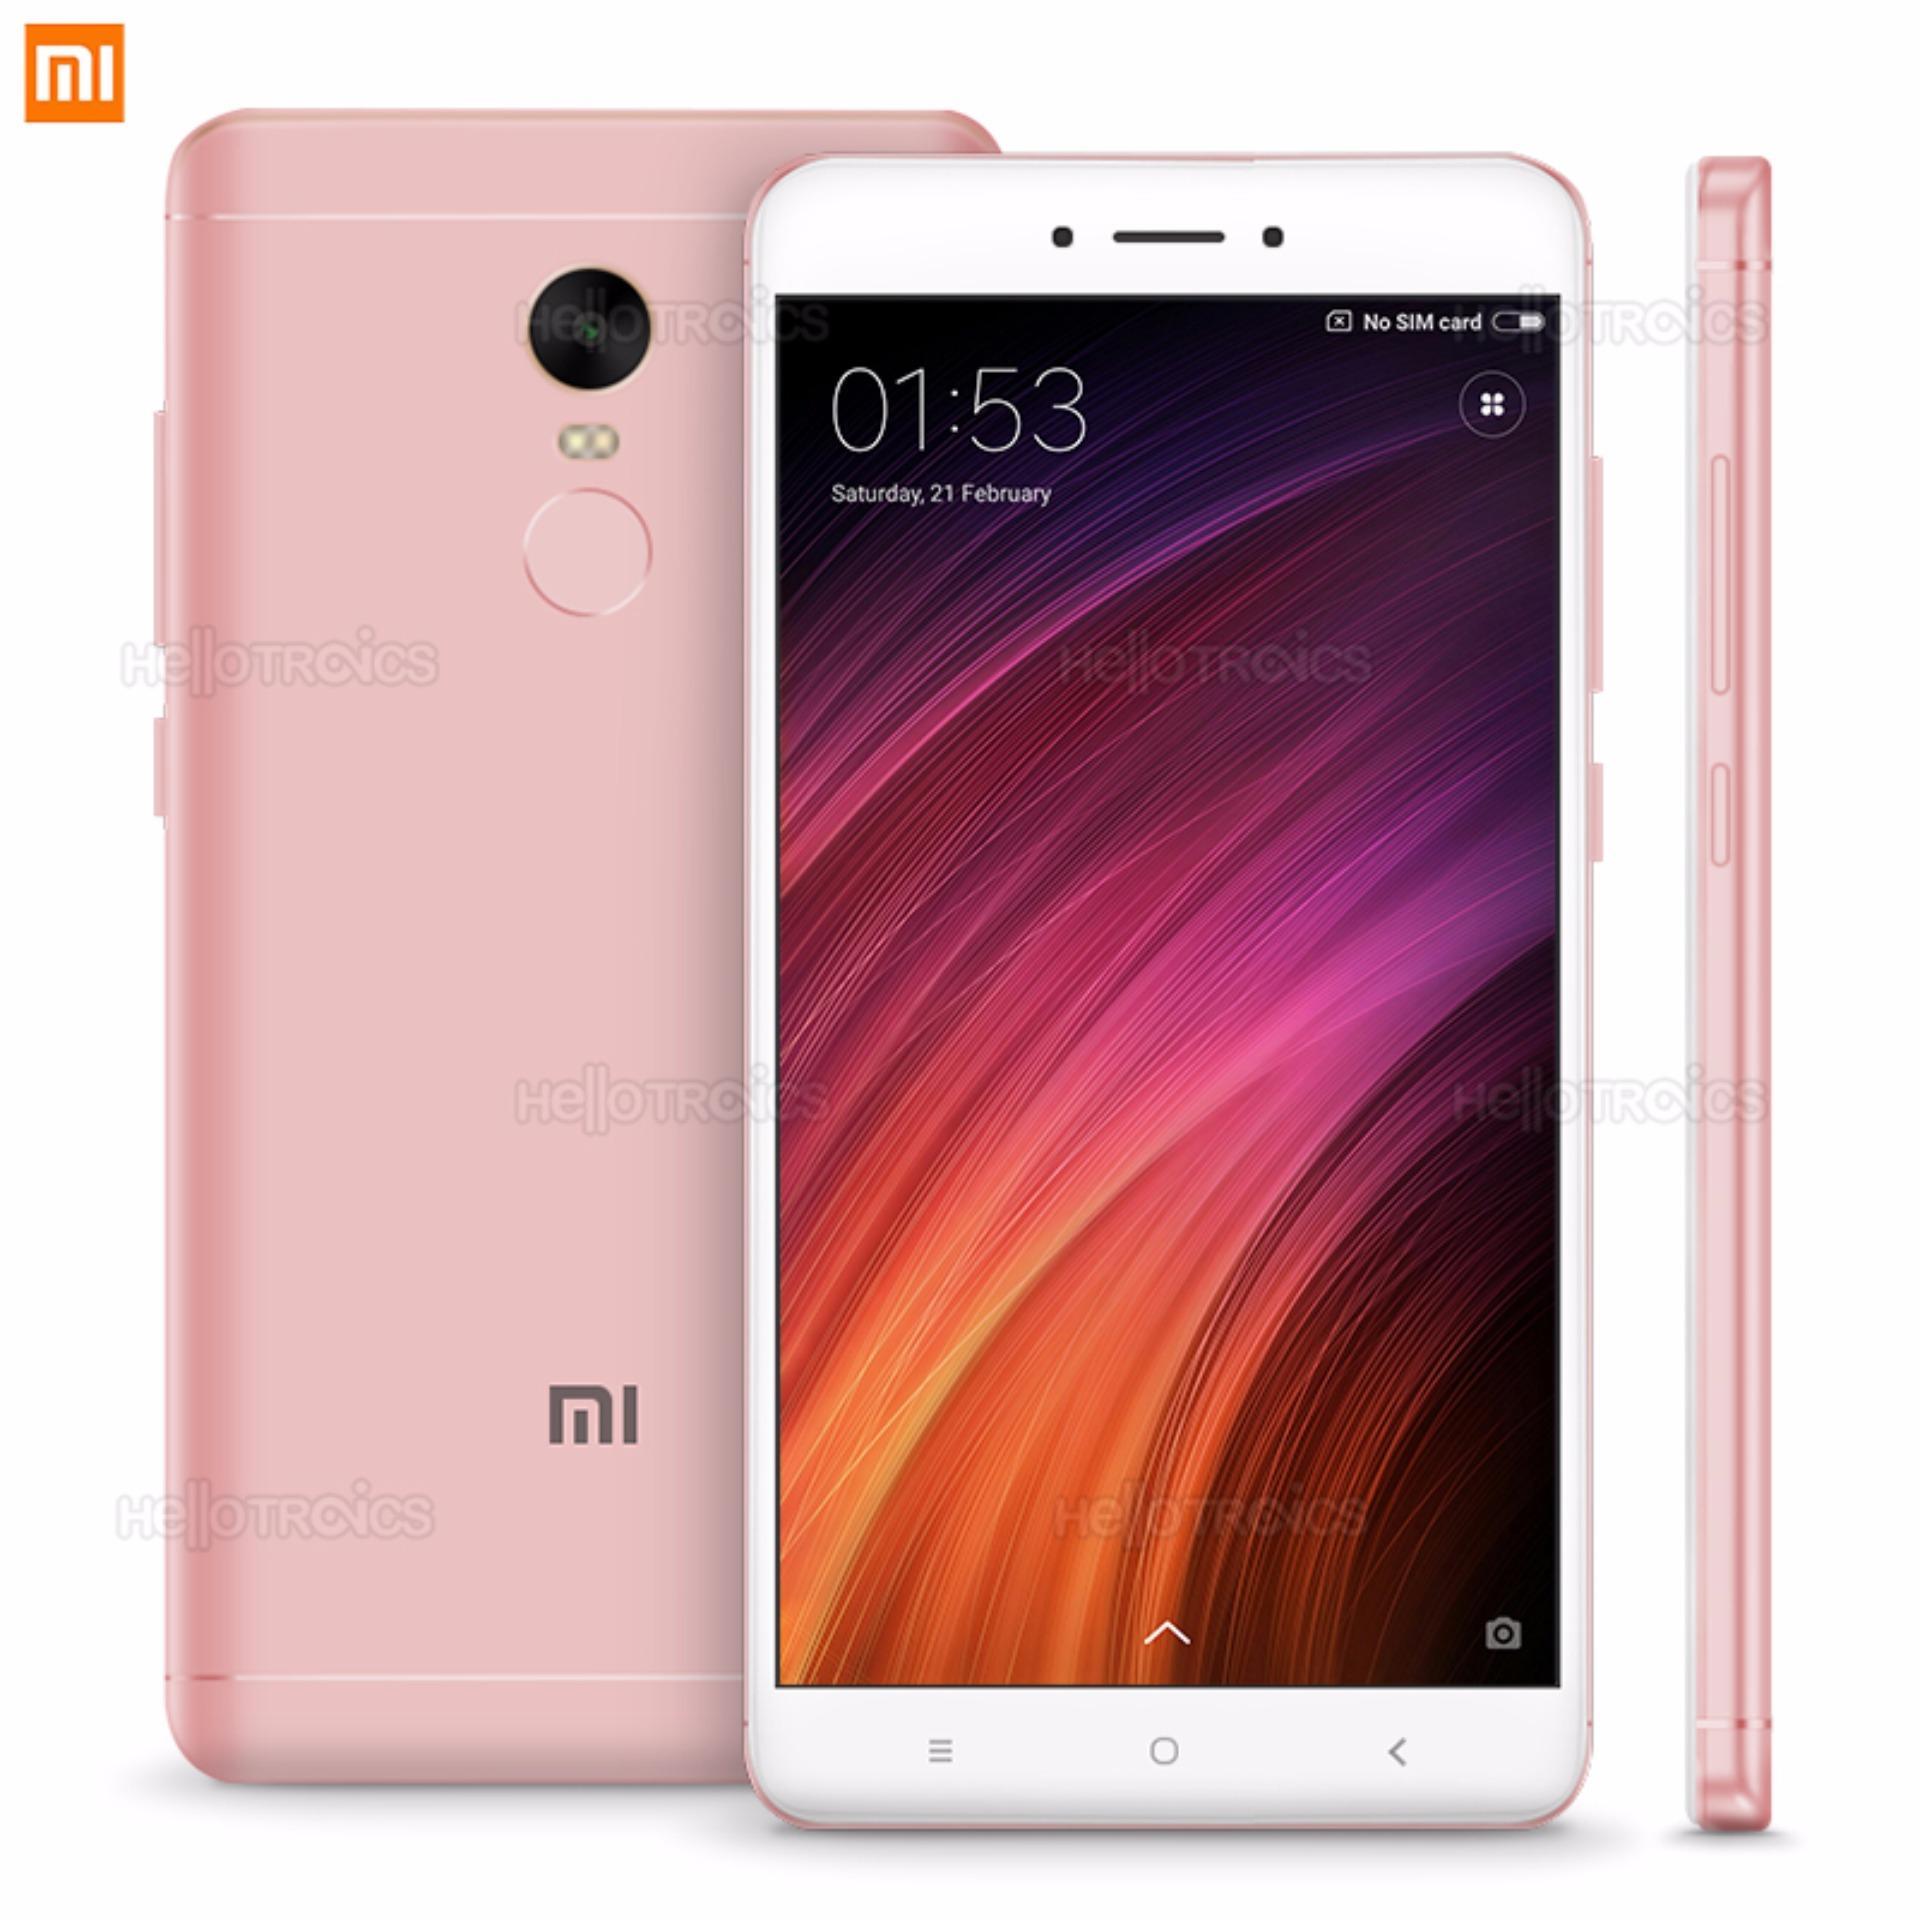 Xiaomi redmi note 4x 4gb ram 64gb rom pink lazada ph stopboris Images